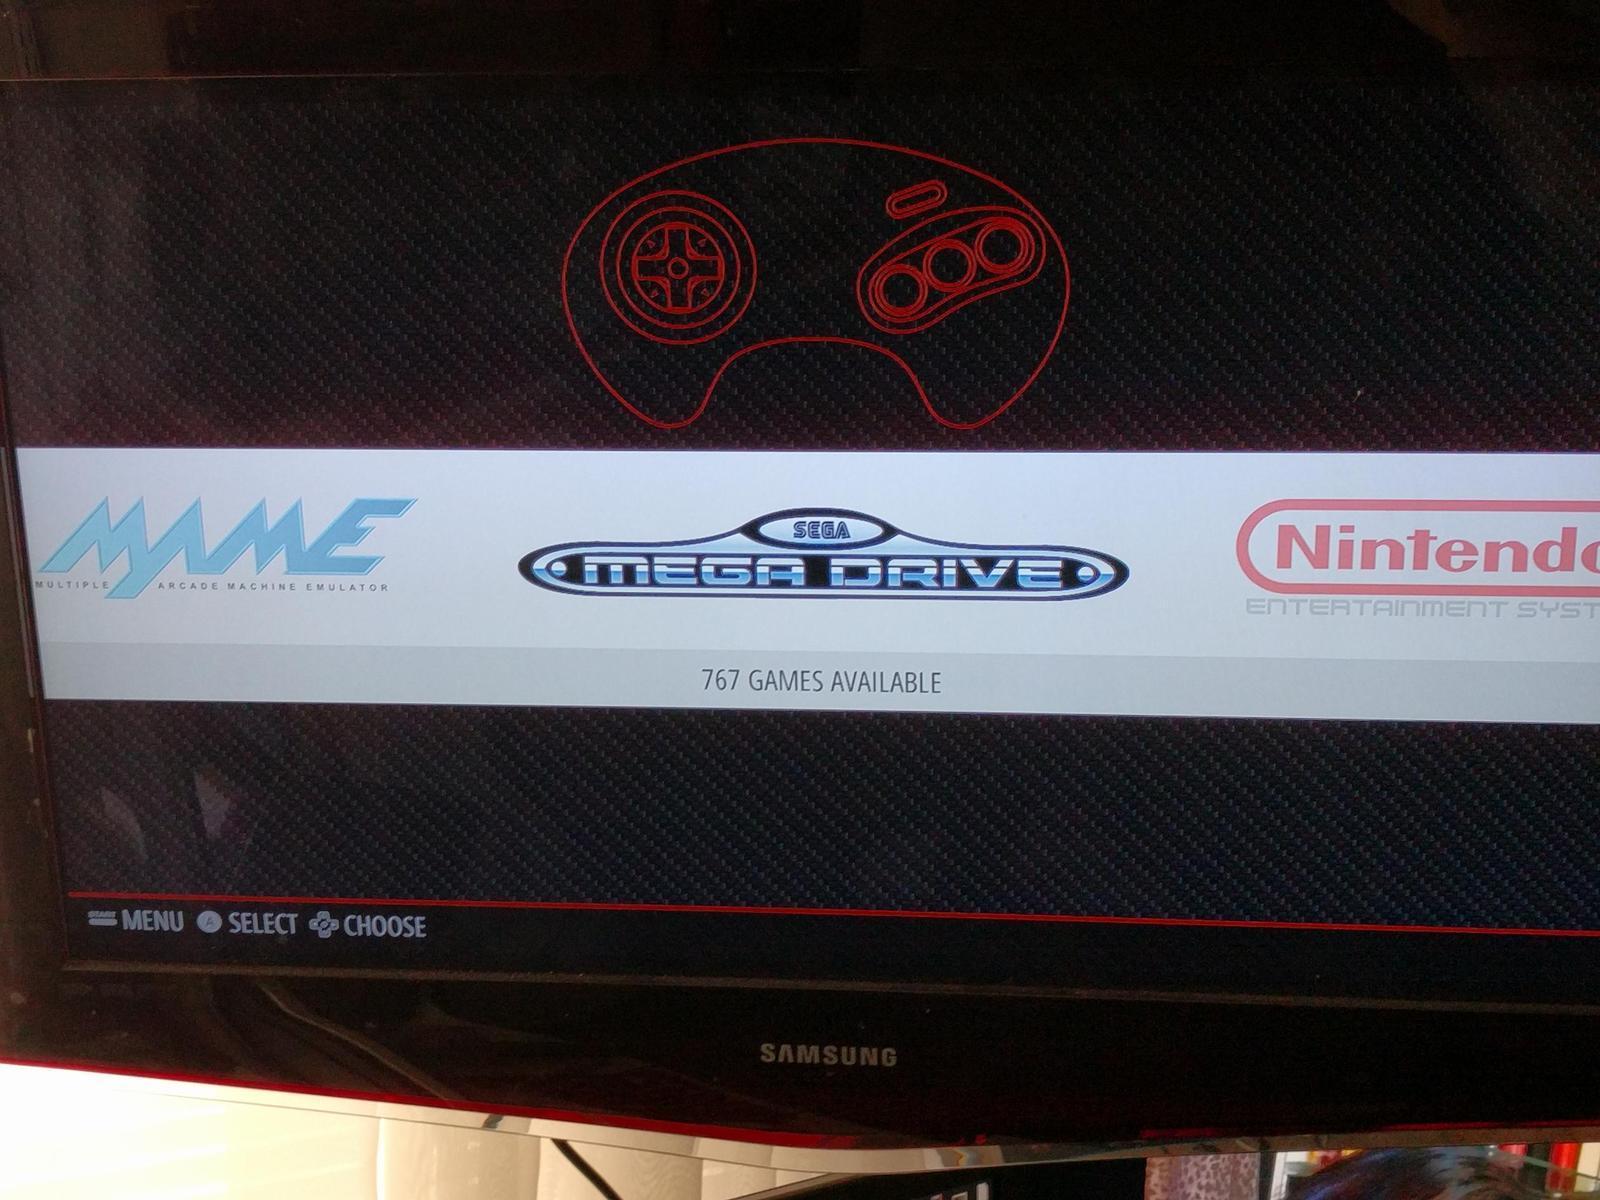 Raspberry Pi 3 mini Sega Genesis 16GB with Controller. Plays thousands of games